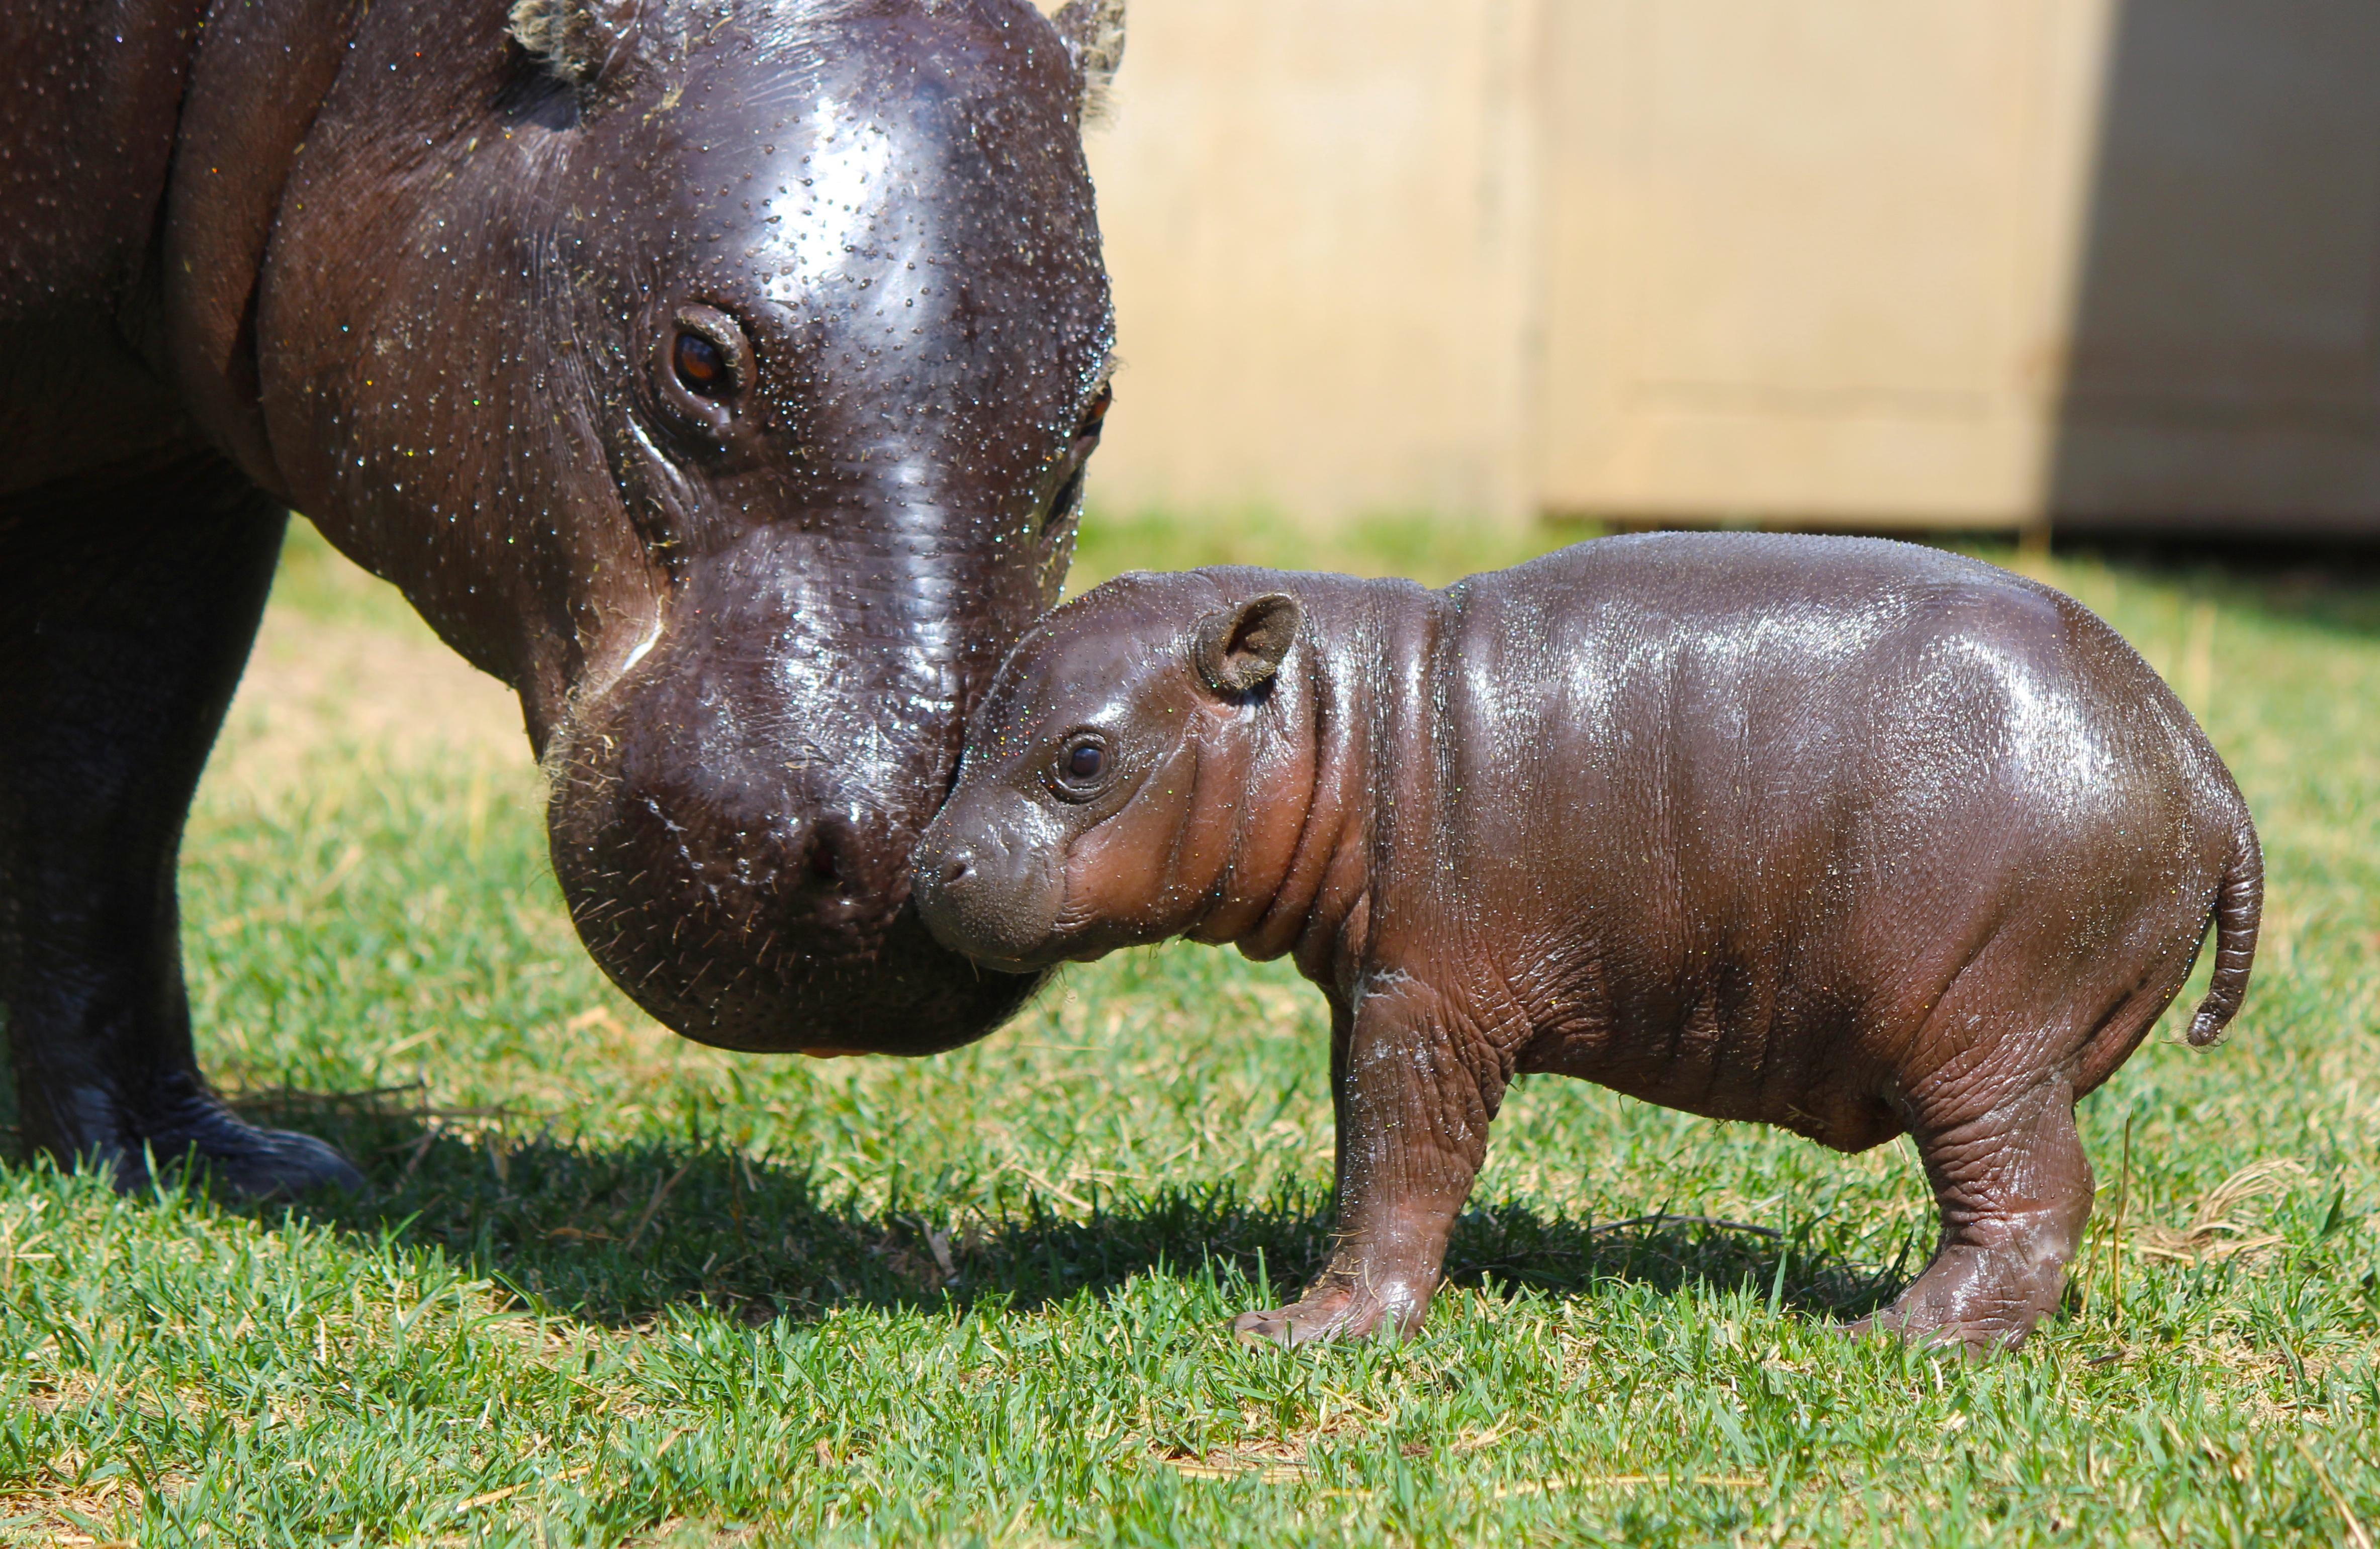 Tanganyika Wildlife Park Achieves Humane Certification for Animal